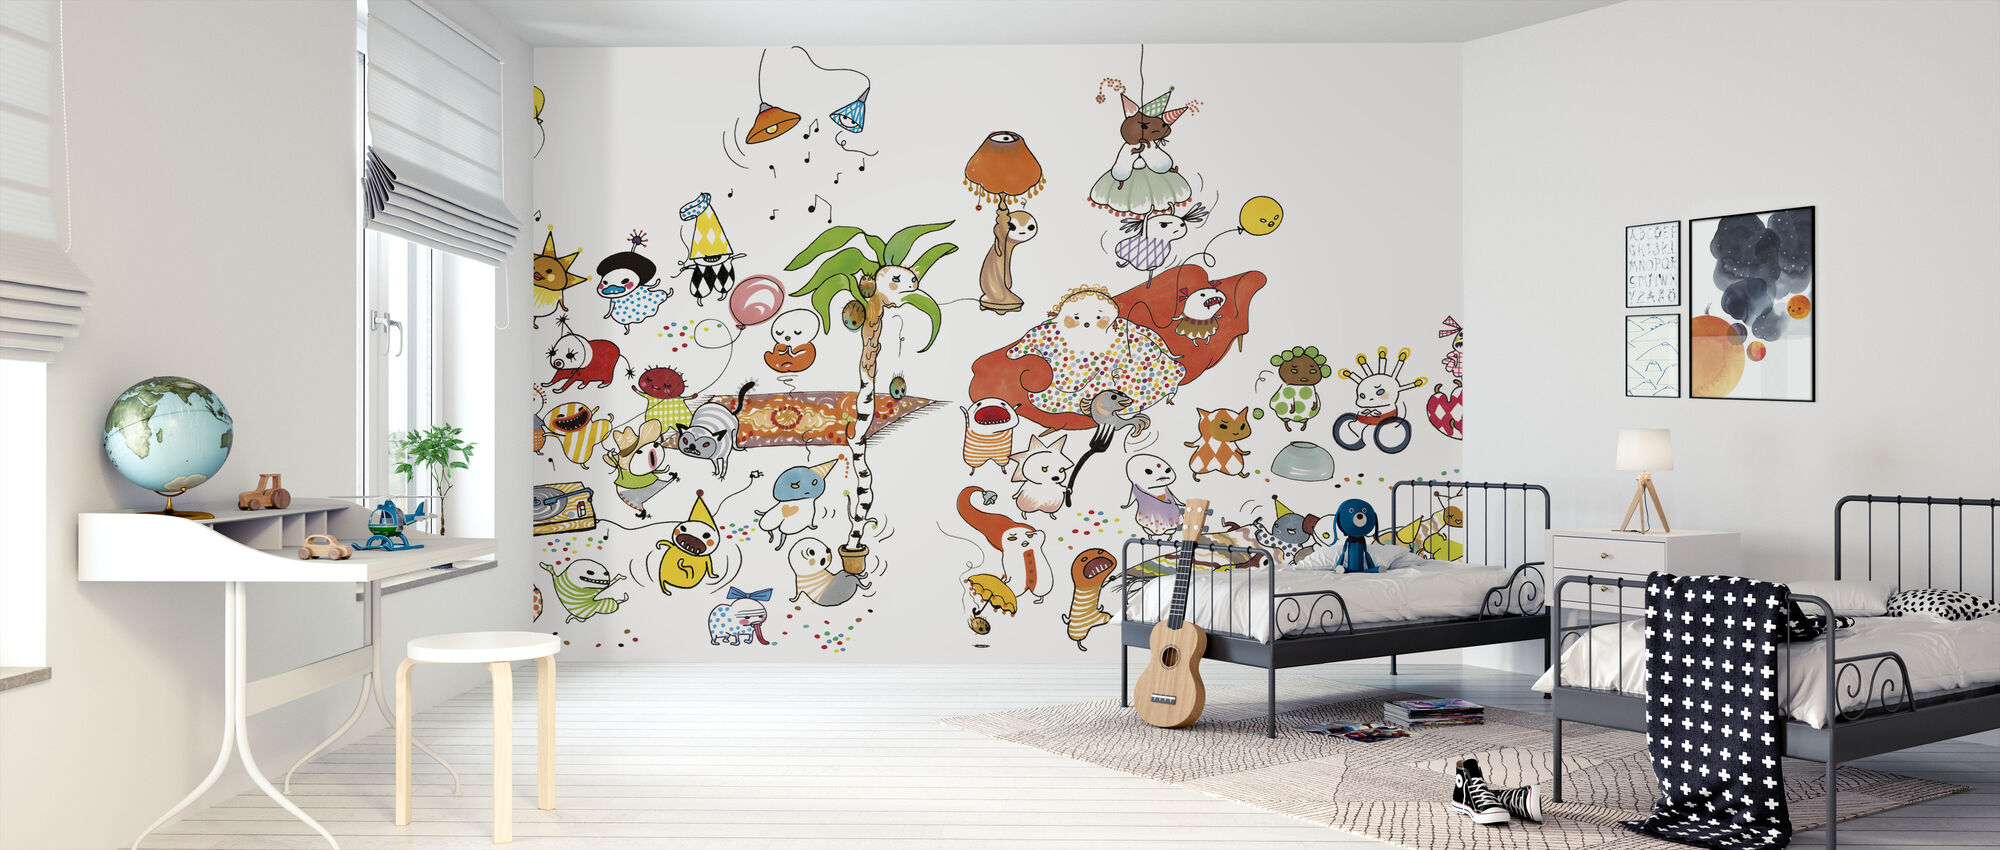 Fest XL - Behang - Kinderkamer